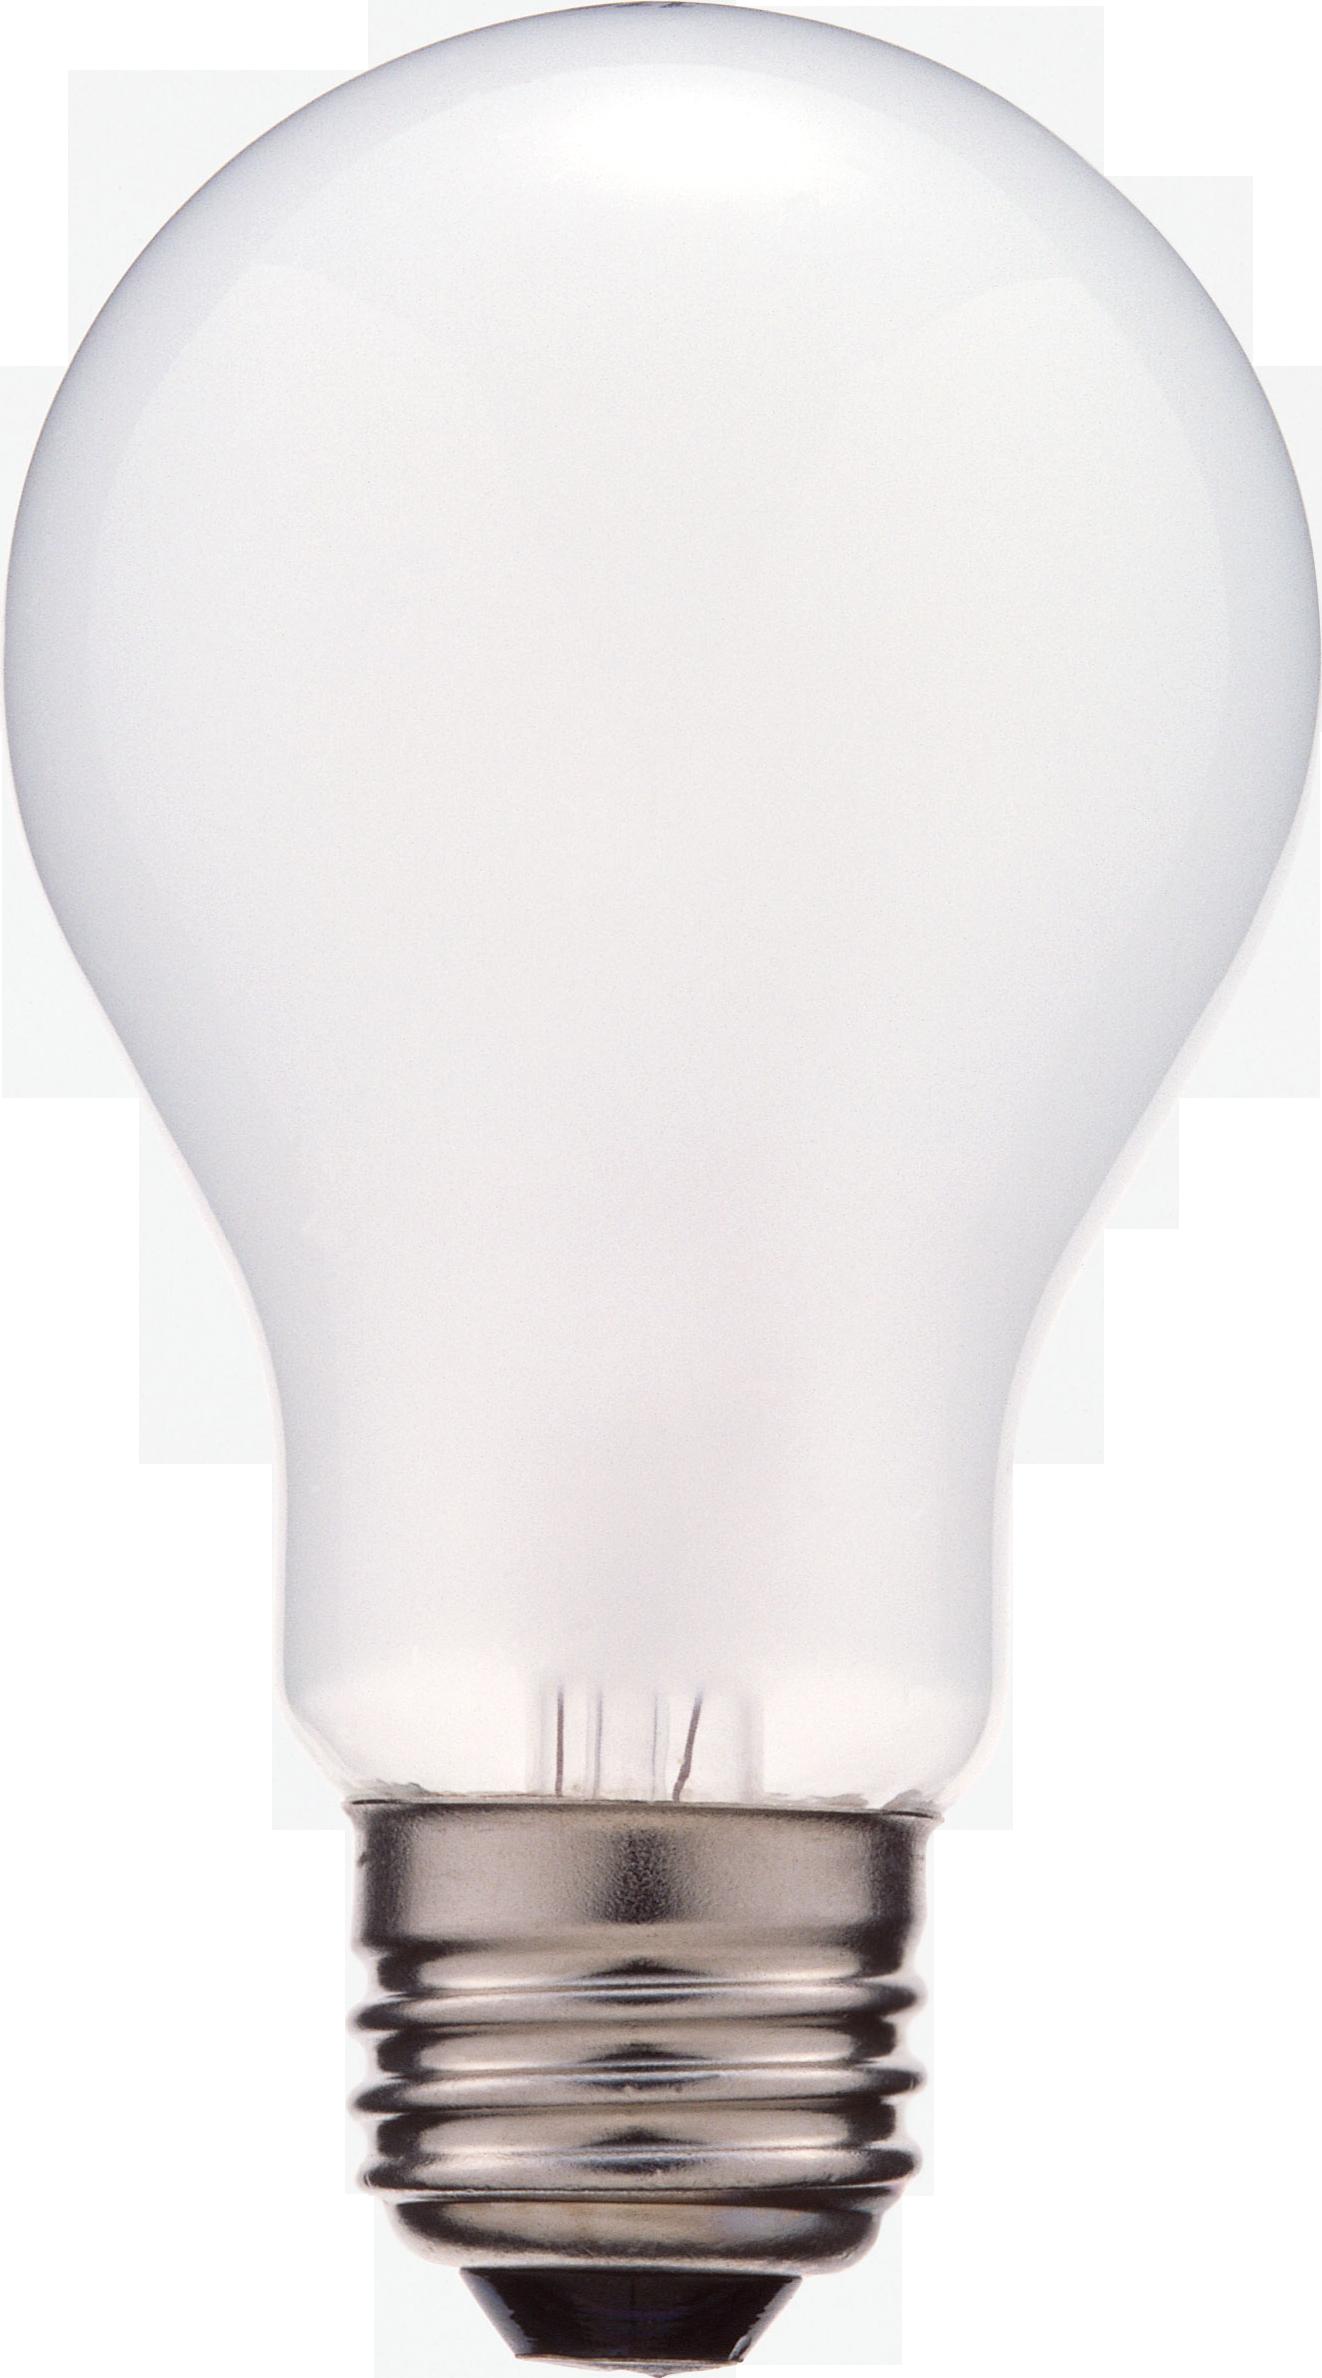 Transparent png pictures free. Lamp clipart lalten